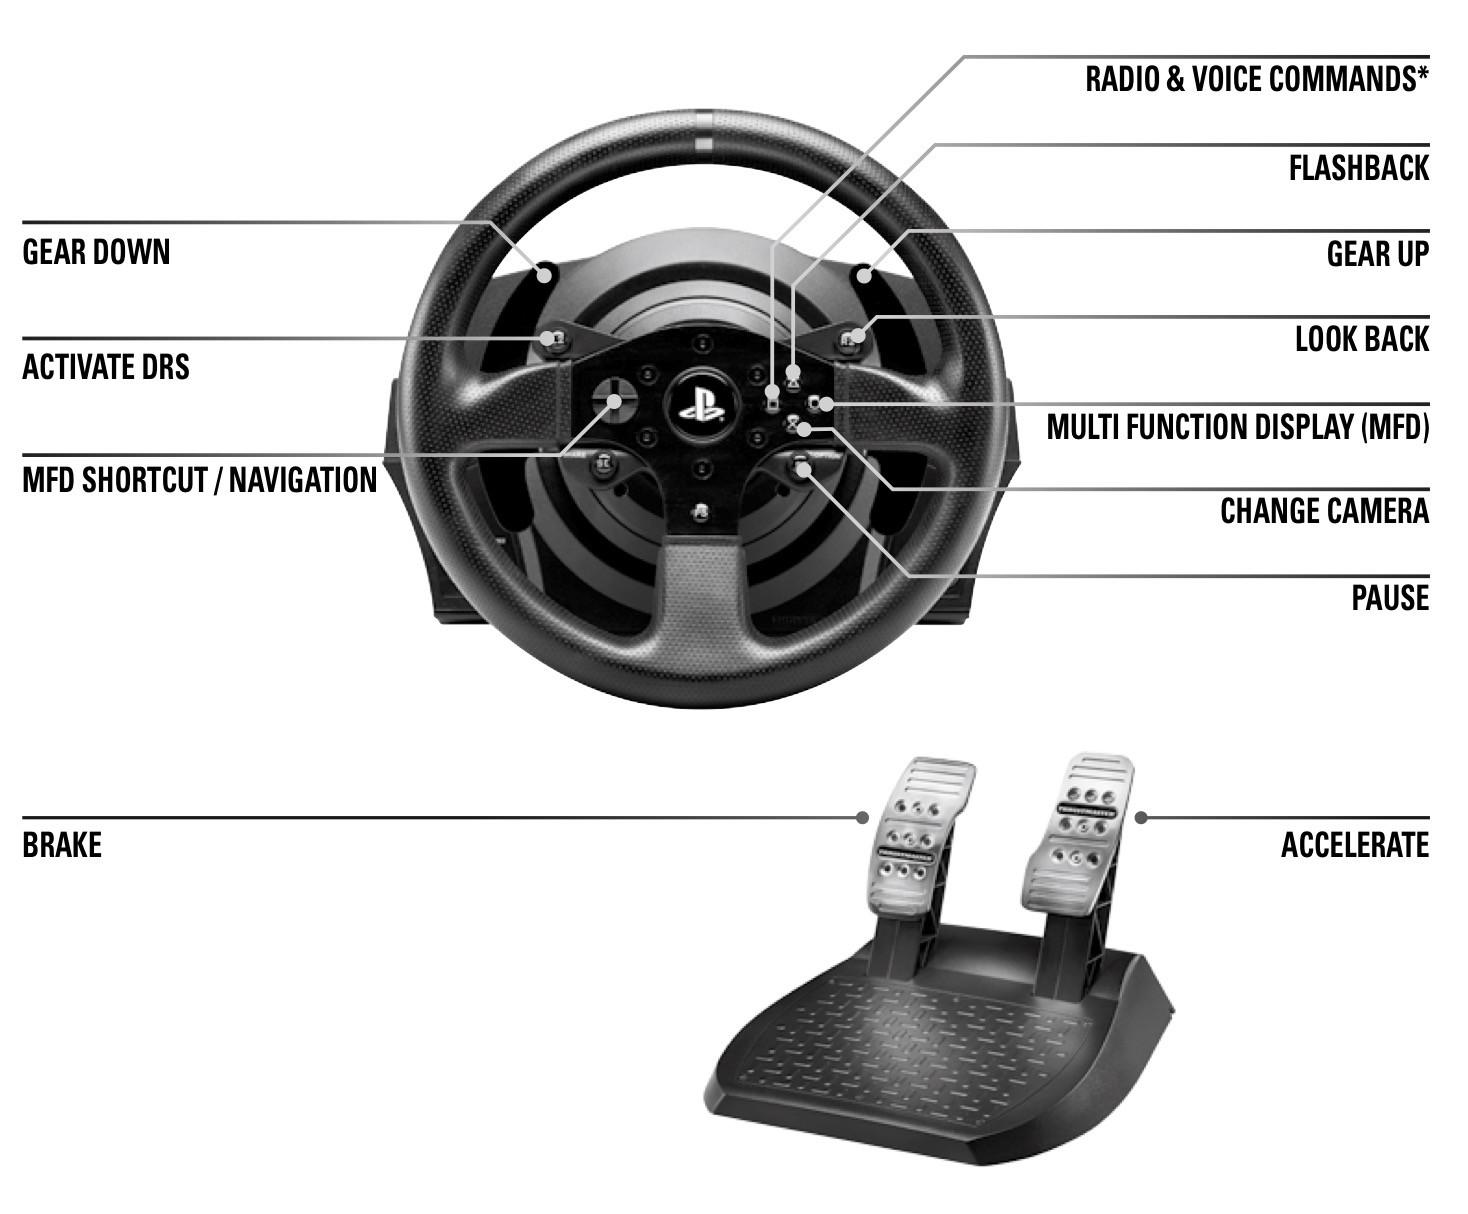 64e84b70d7e F1™ 2017 Racing Wheel : MGW: Game Cheats, Cheat Codes, Guides